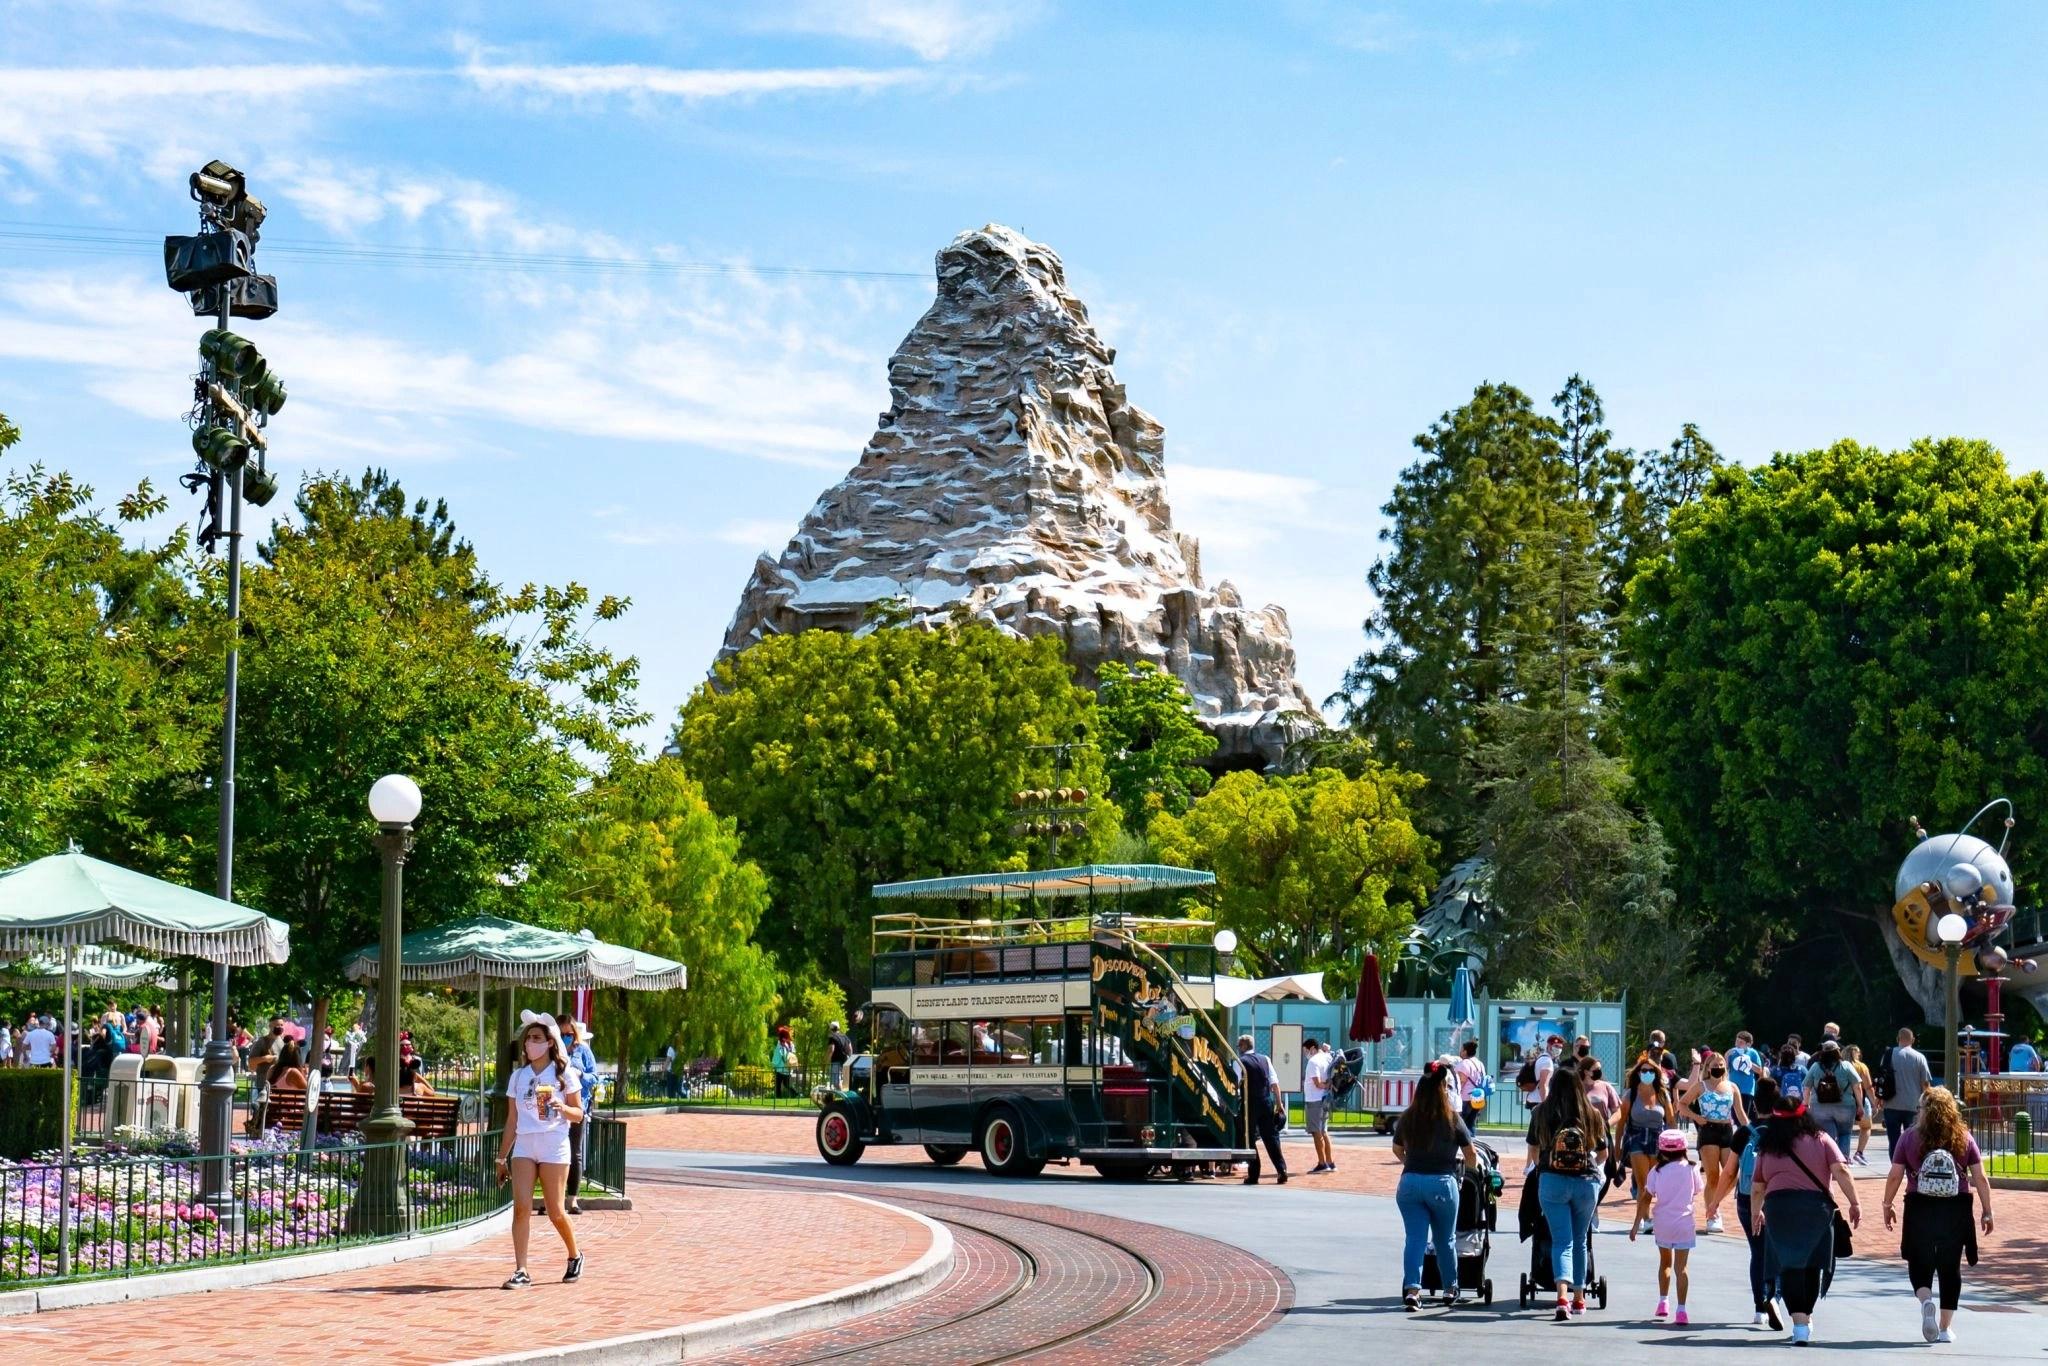 20 years apart, two tragic deaths on Disneyland's Matterhorn